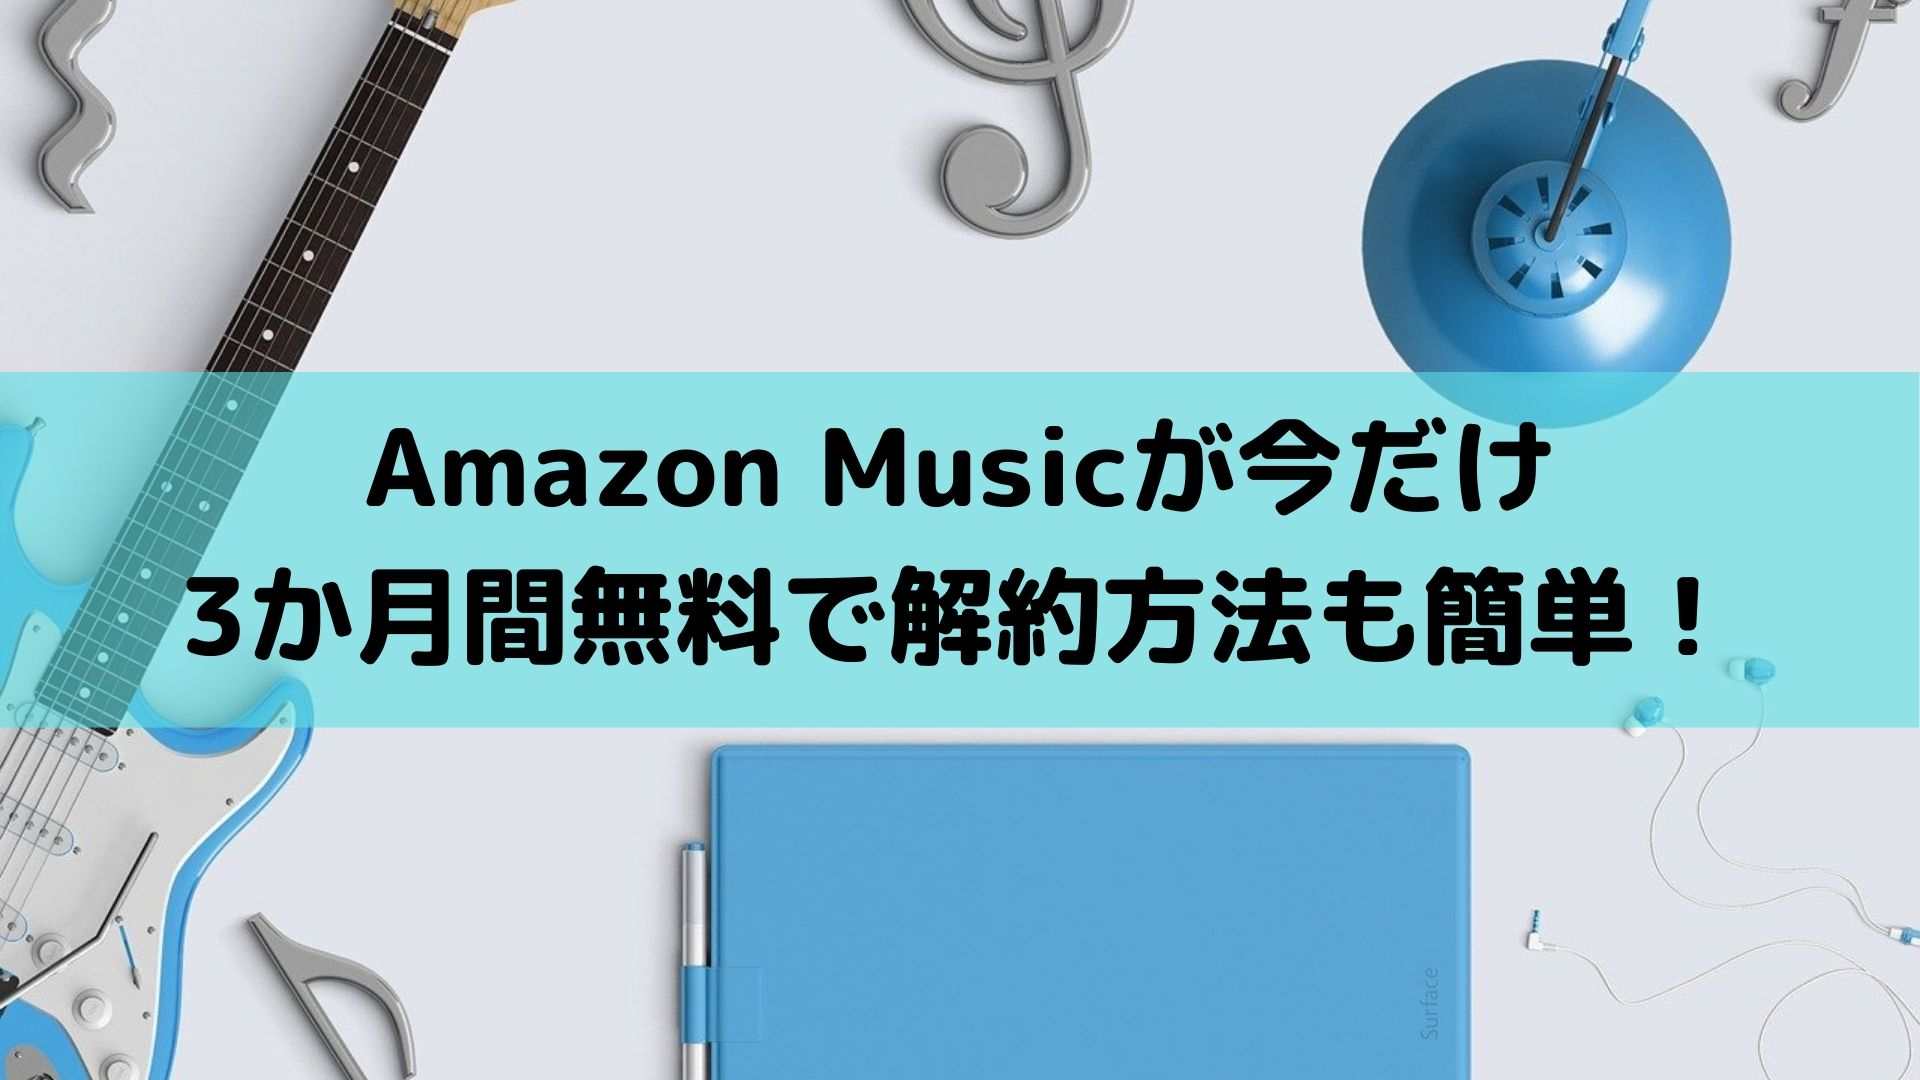 Amazon Musicが今だけ3か月間無料で解約方法も簡単!